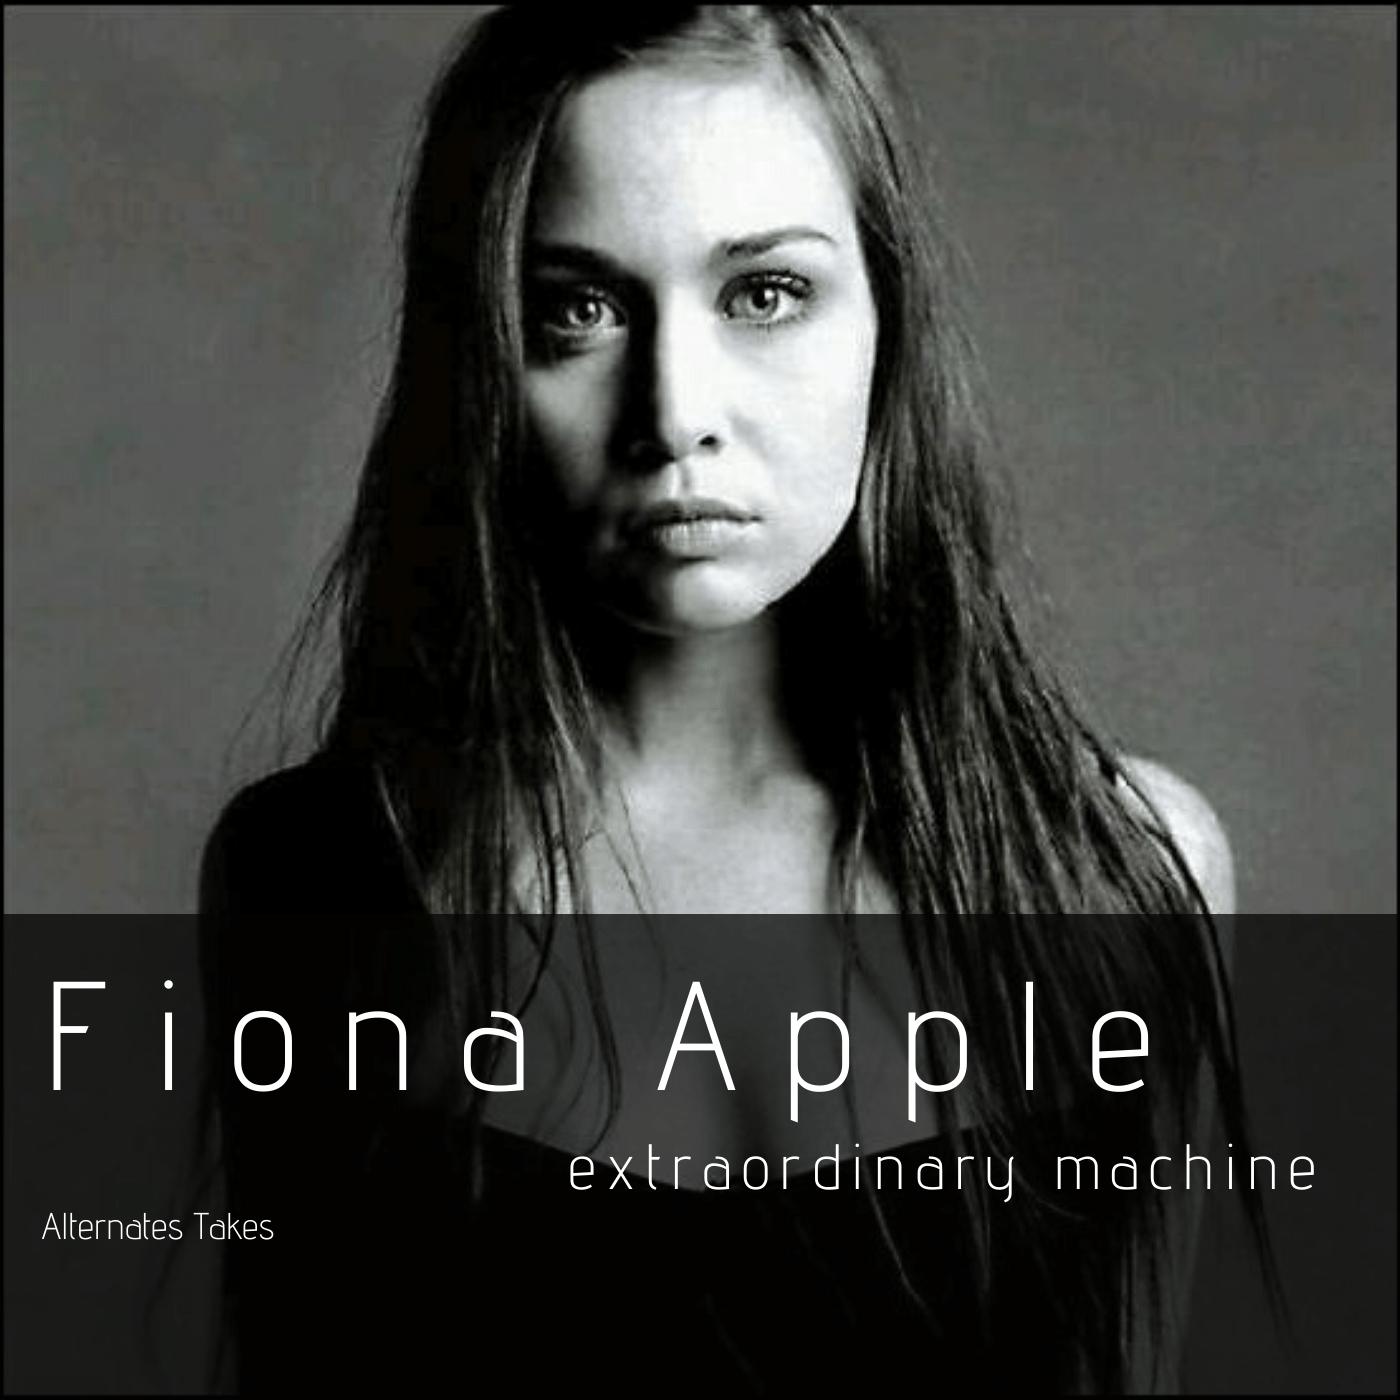 Fiona Apple, extraordinary machine.